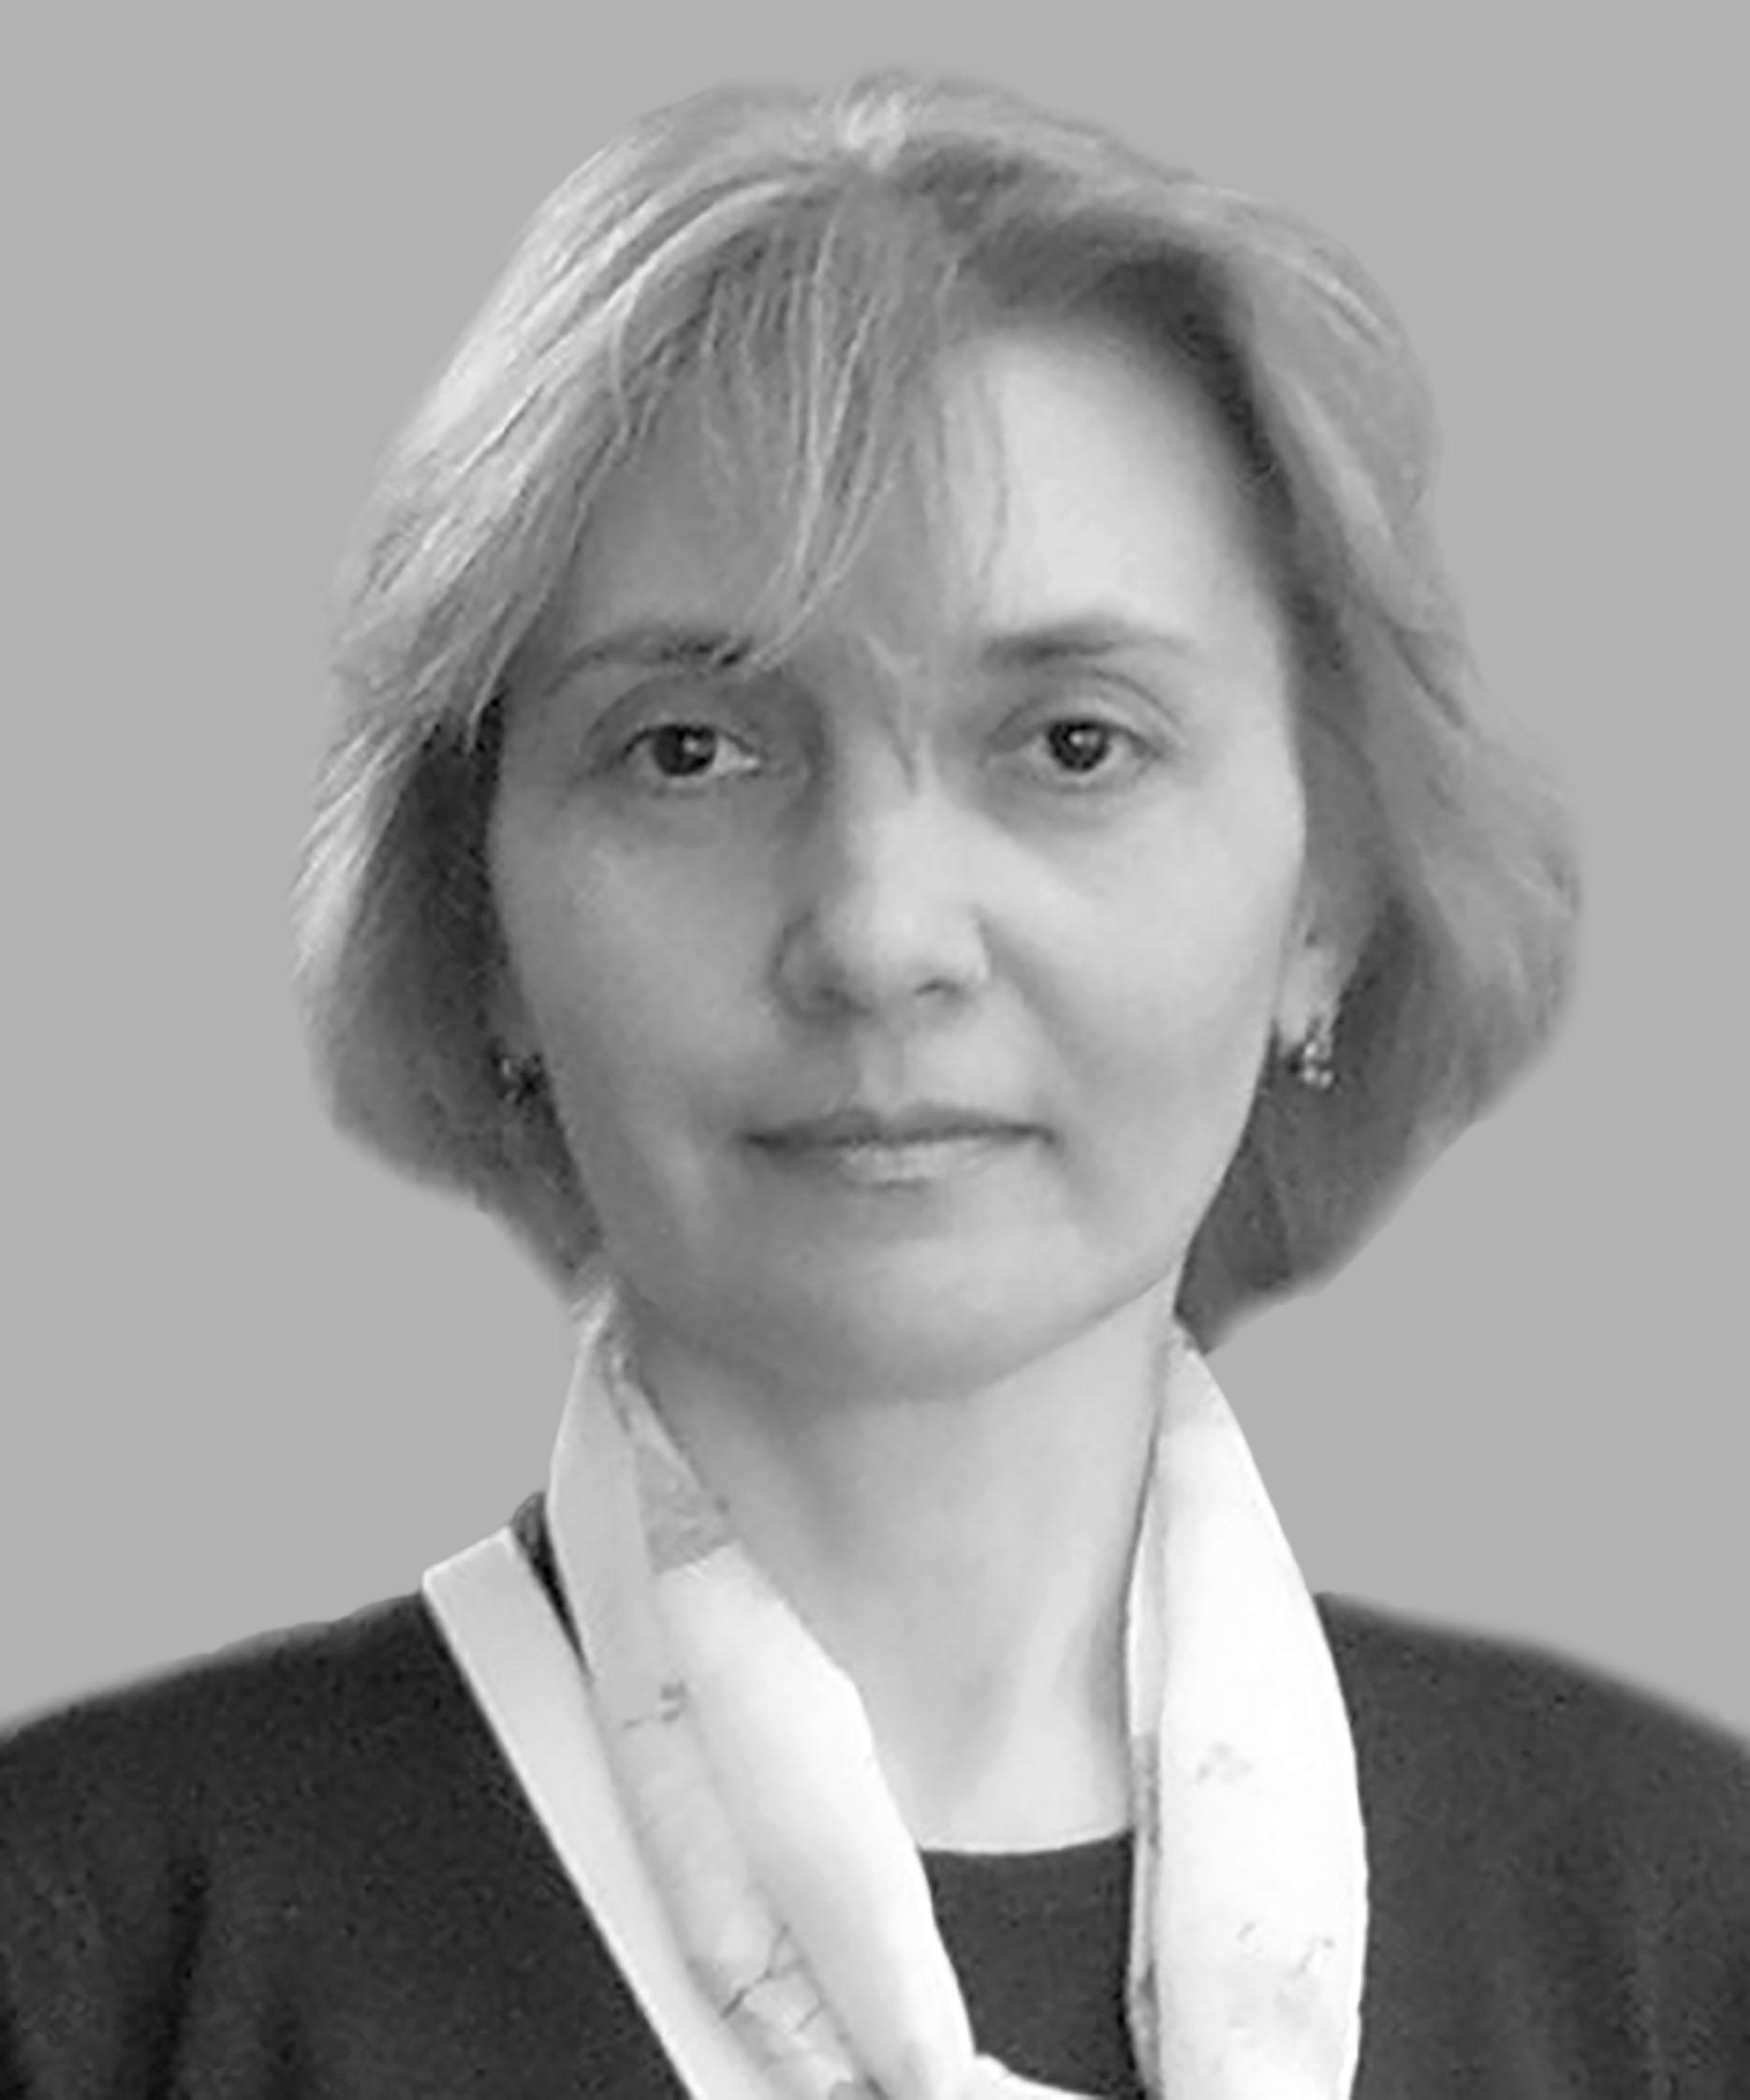 Маркар'ян Алла Петрівна